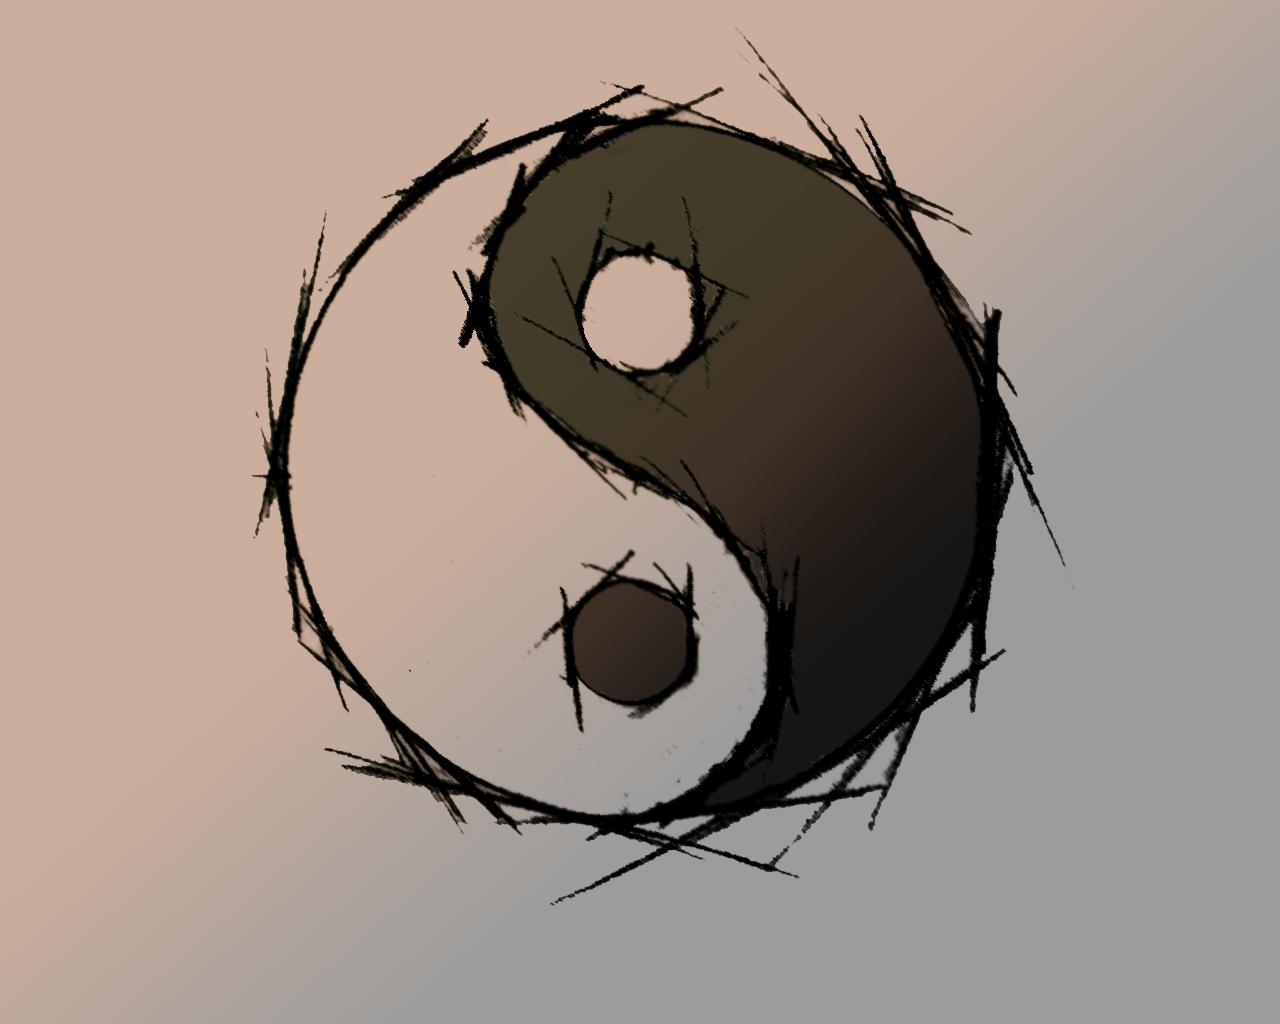 Ying And Yang Wallpapers - Wallpaper Cave